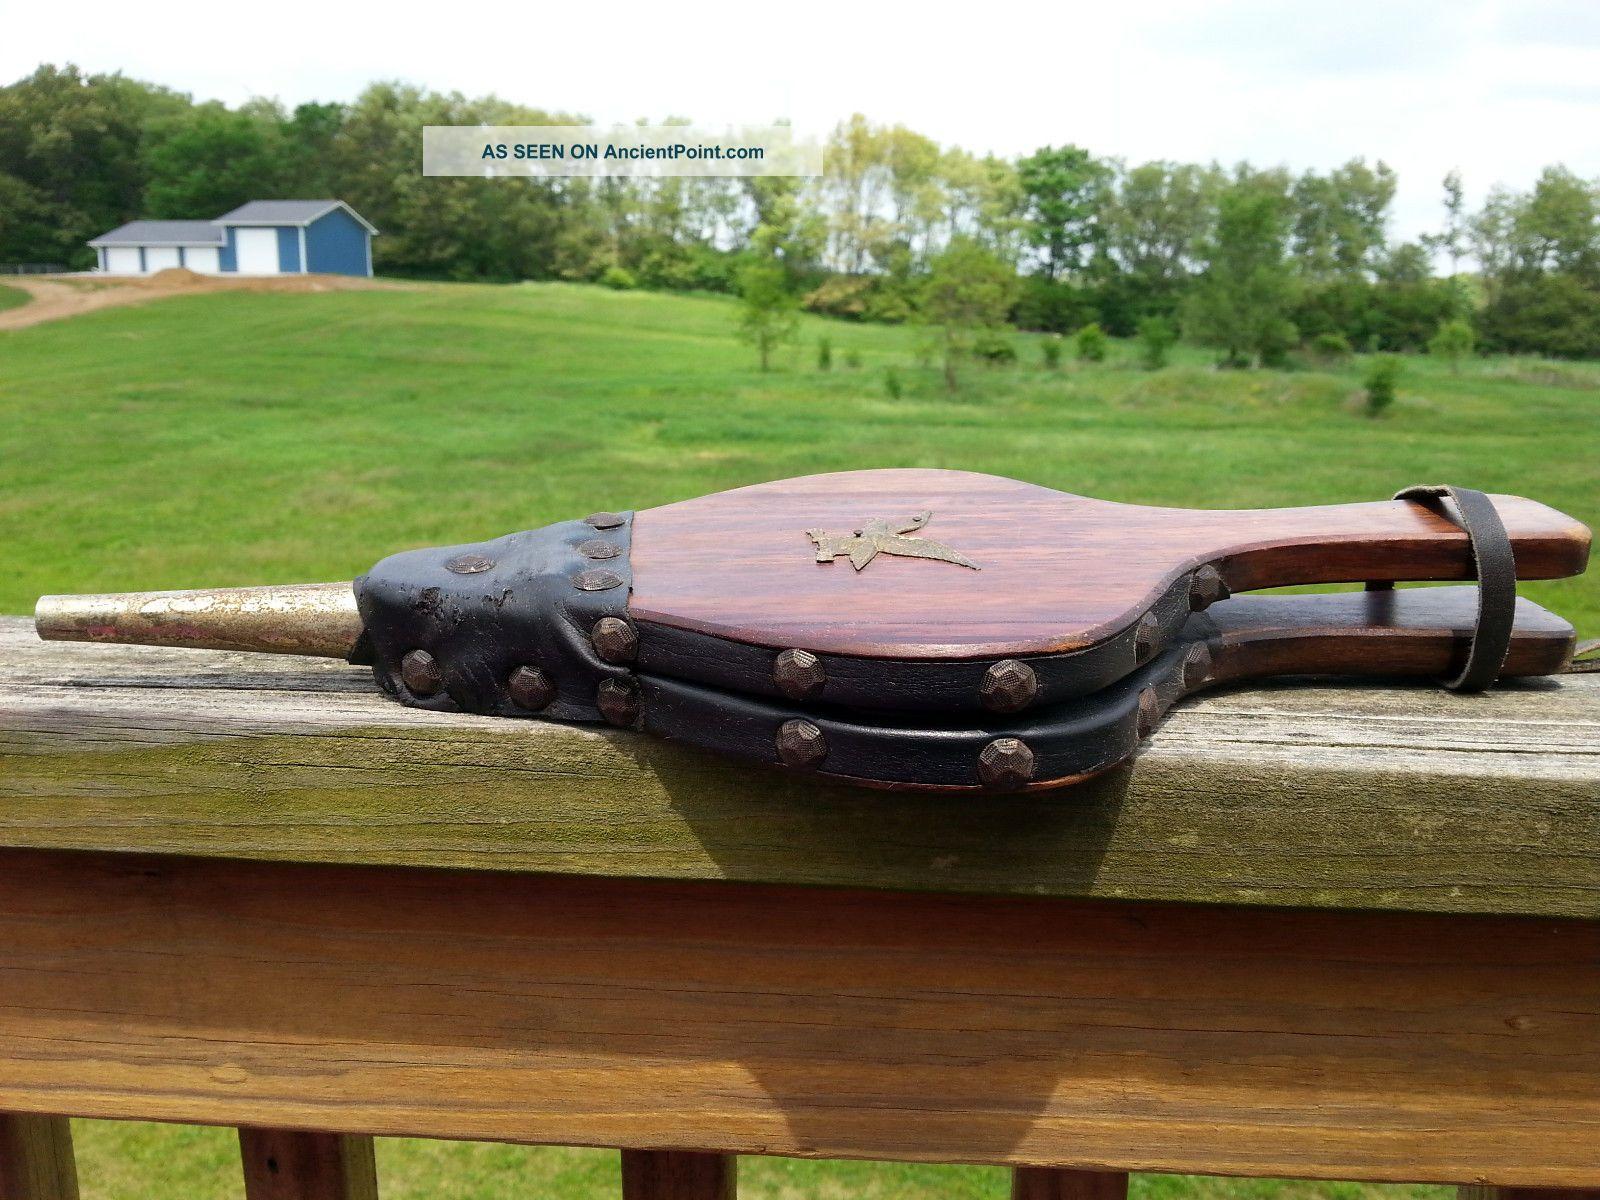 Vtg Antique Eagle Emblem Fireplace Leather Wood Bellow Hand Pimp Air Ash Blower Hearth Ware photo